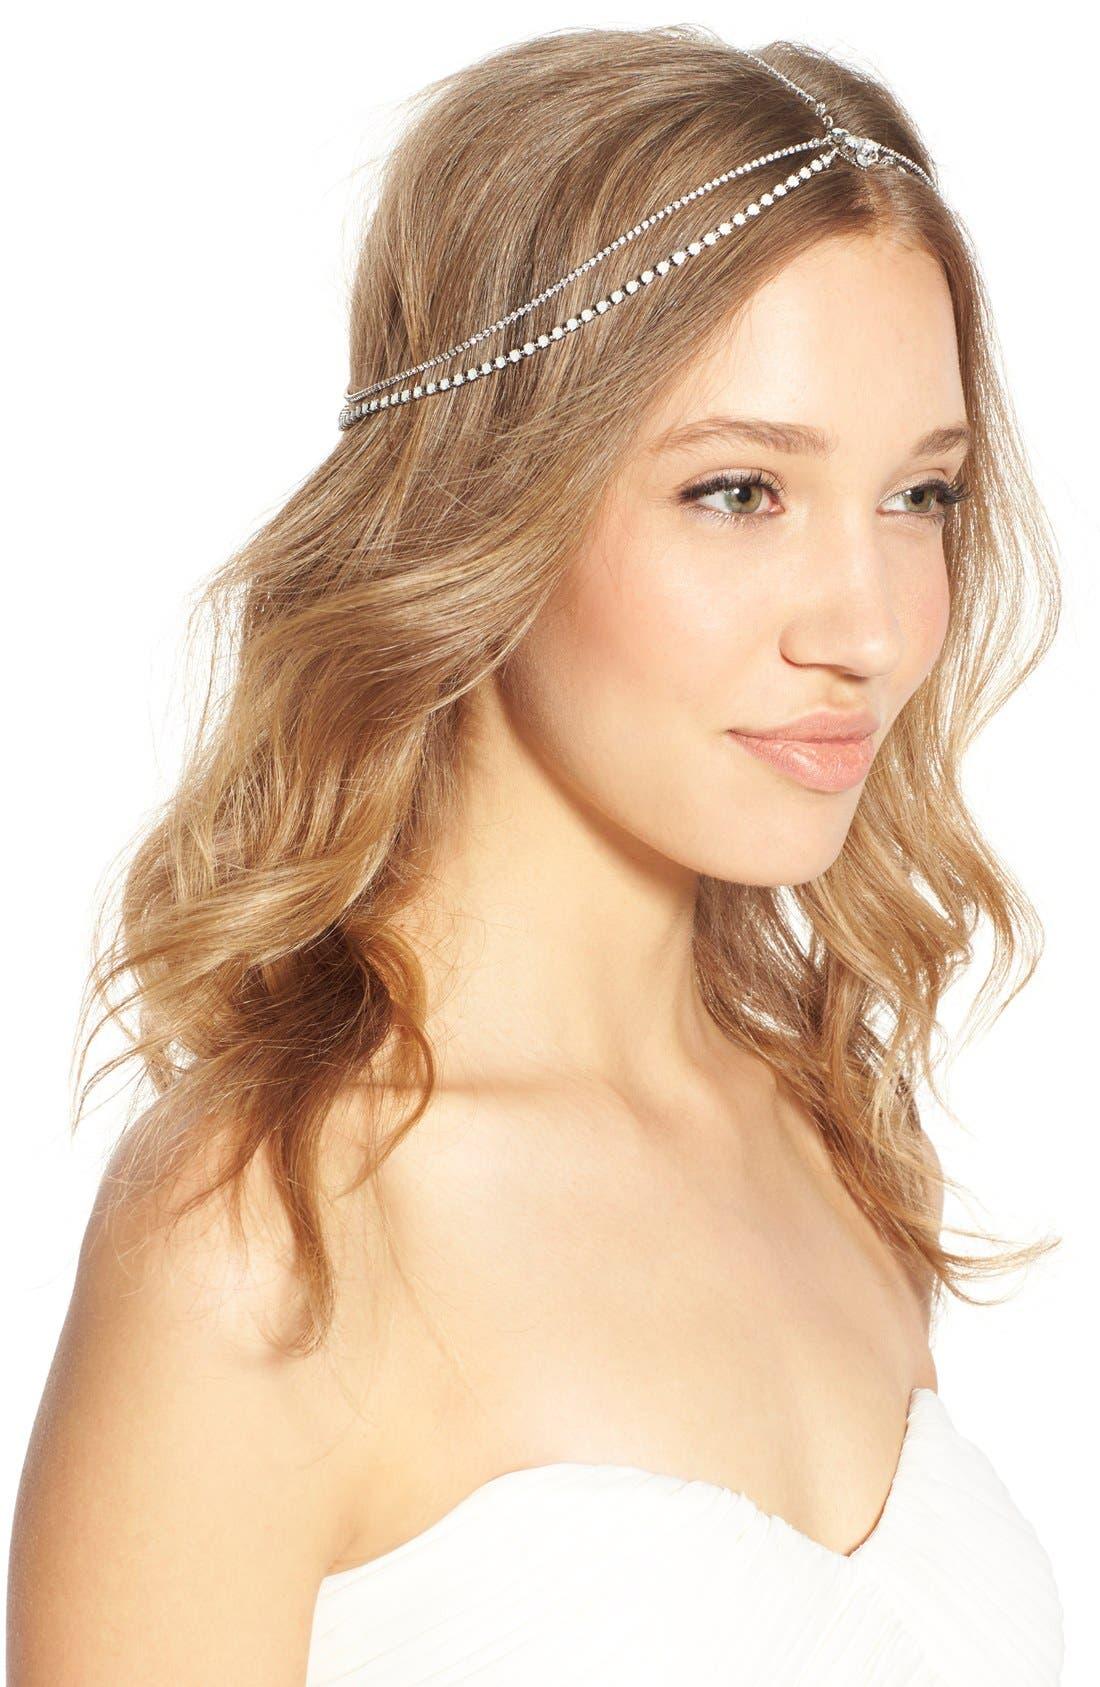 'Lindsay' Embellished Hair Chain,                             Alternate thumbnail 5, color,